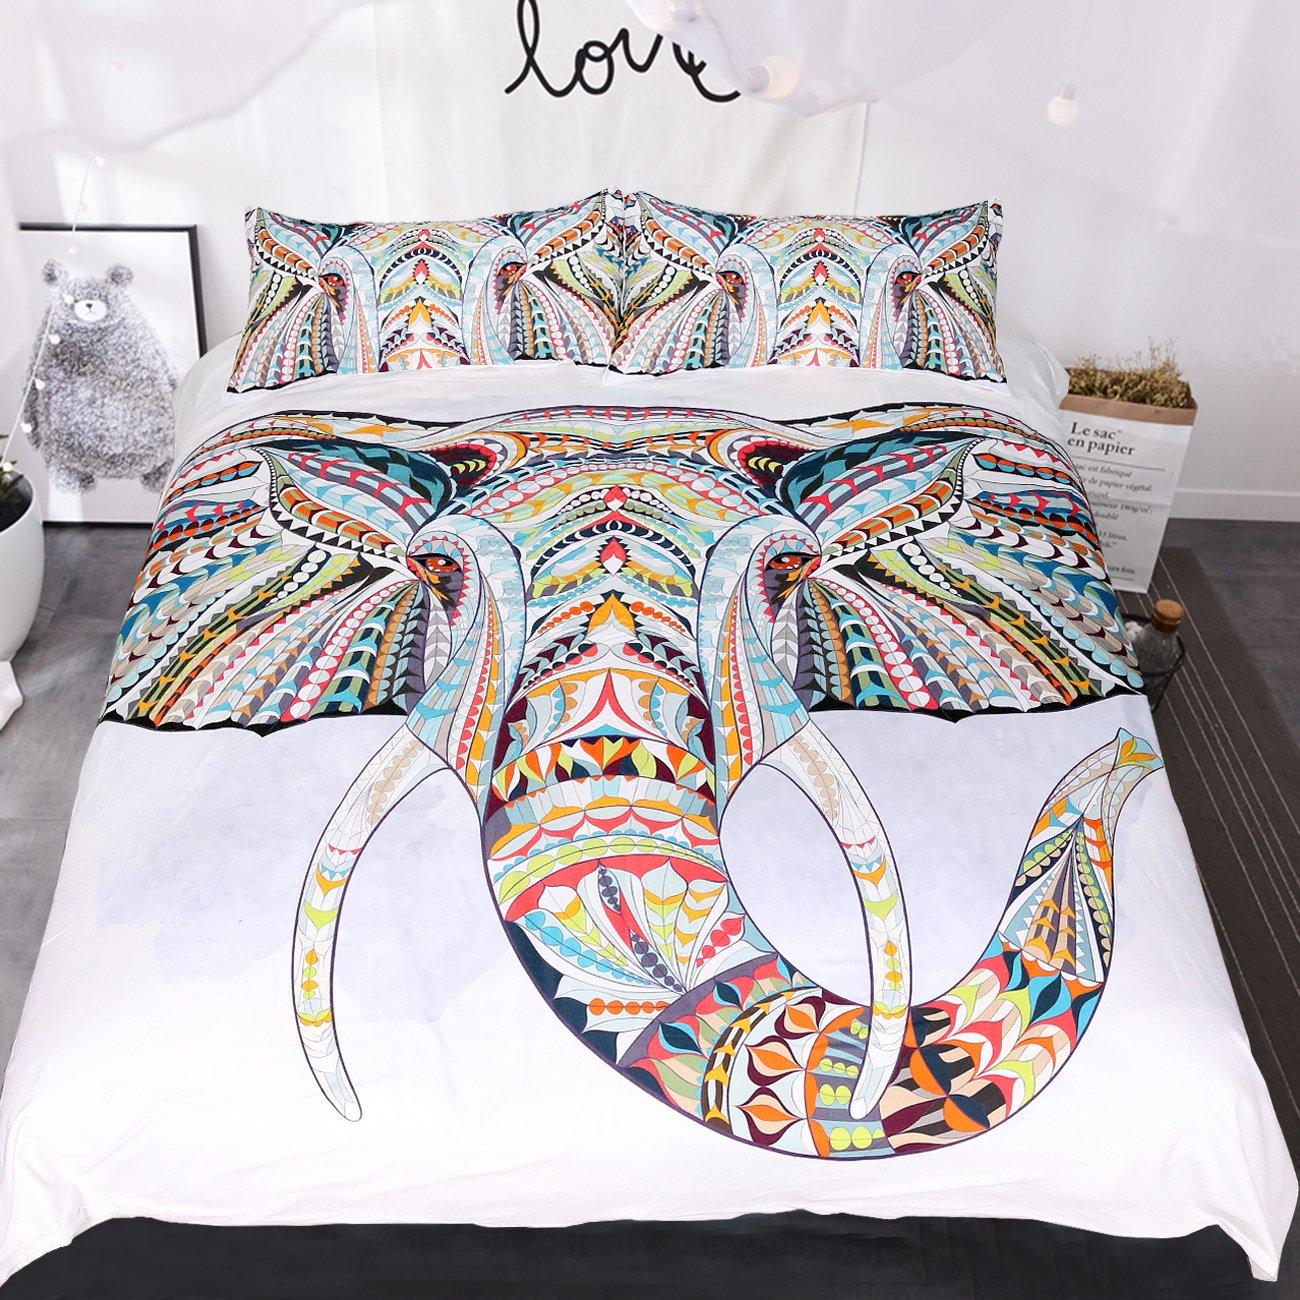 Sleepwish 4 pcs bohemian Bedspread Ethnic Elephant Tree Duvet Cover Exotic BohoDuvetCover Elephant Bed Set Cal-King Size Youhao SBS010258005